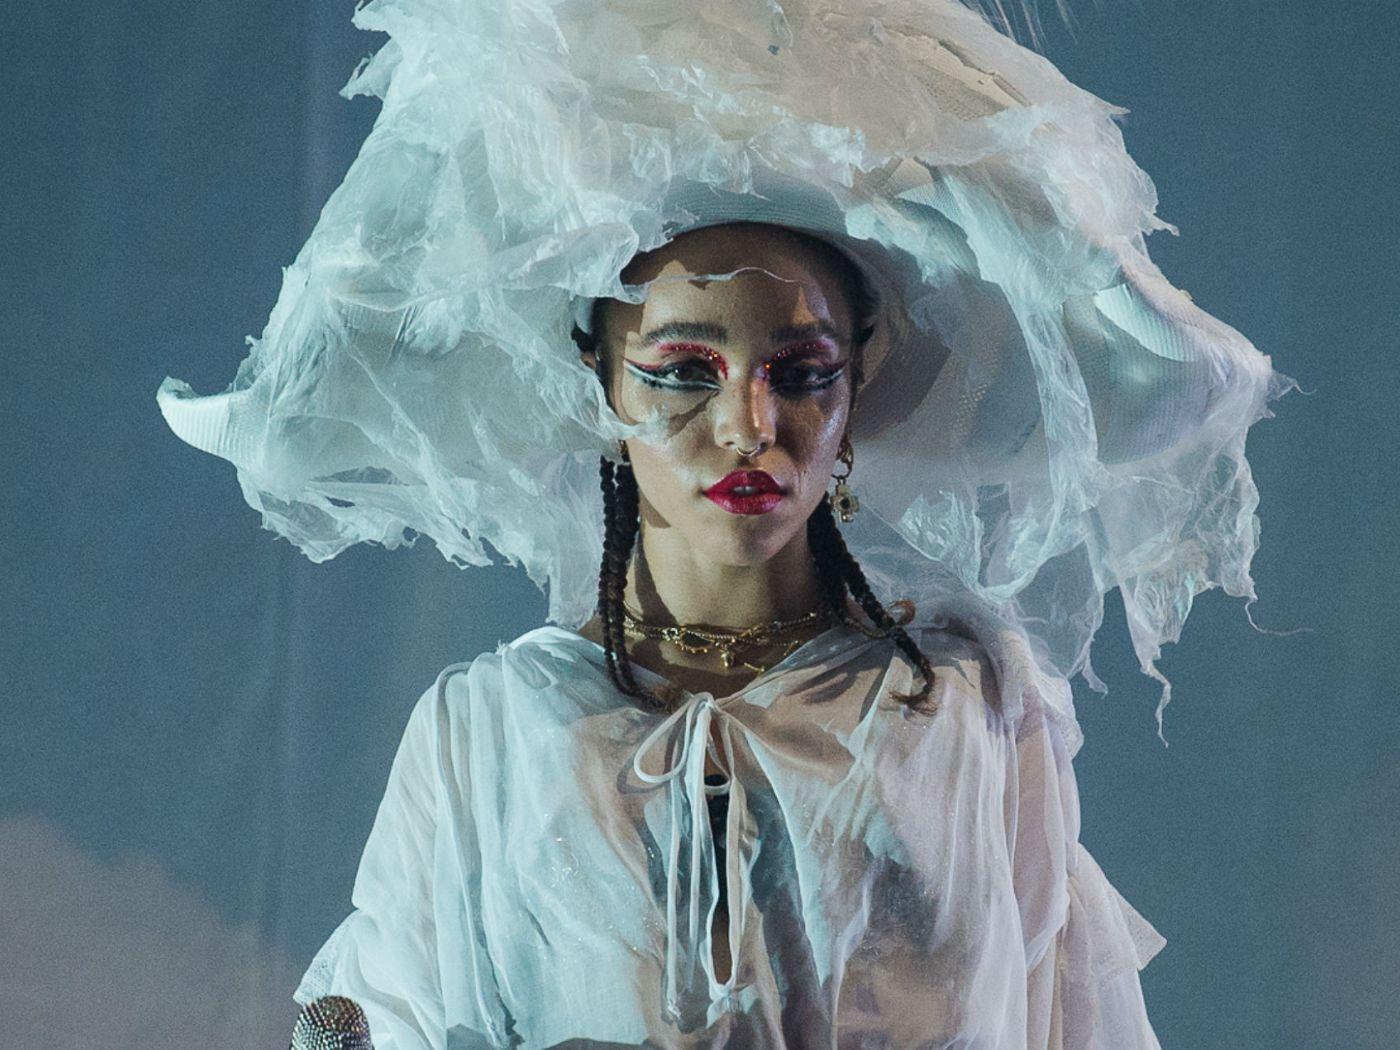 FKA twigs - 'MAGDALENE' album review